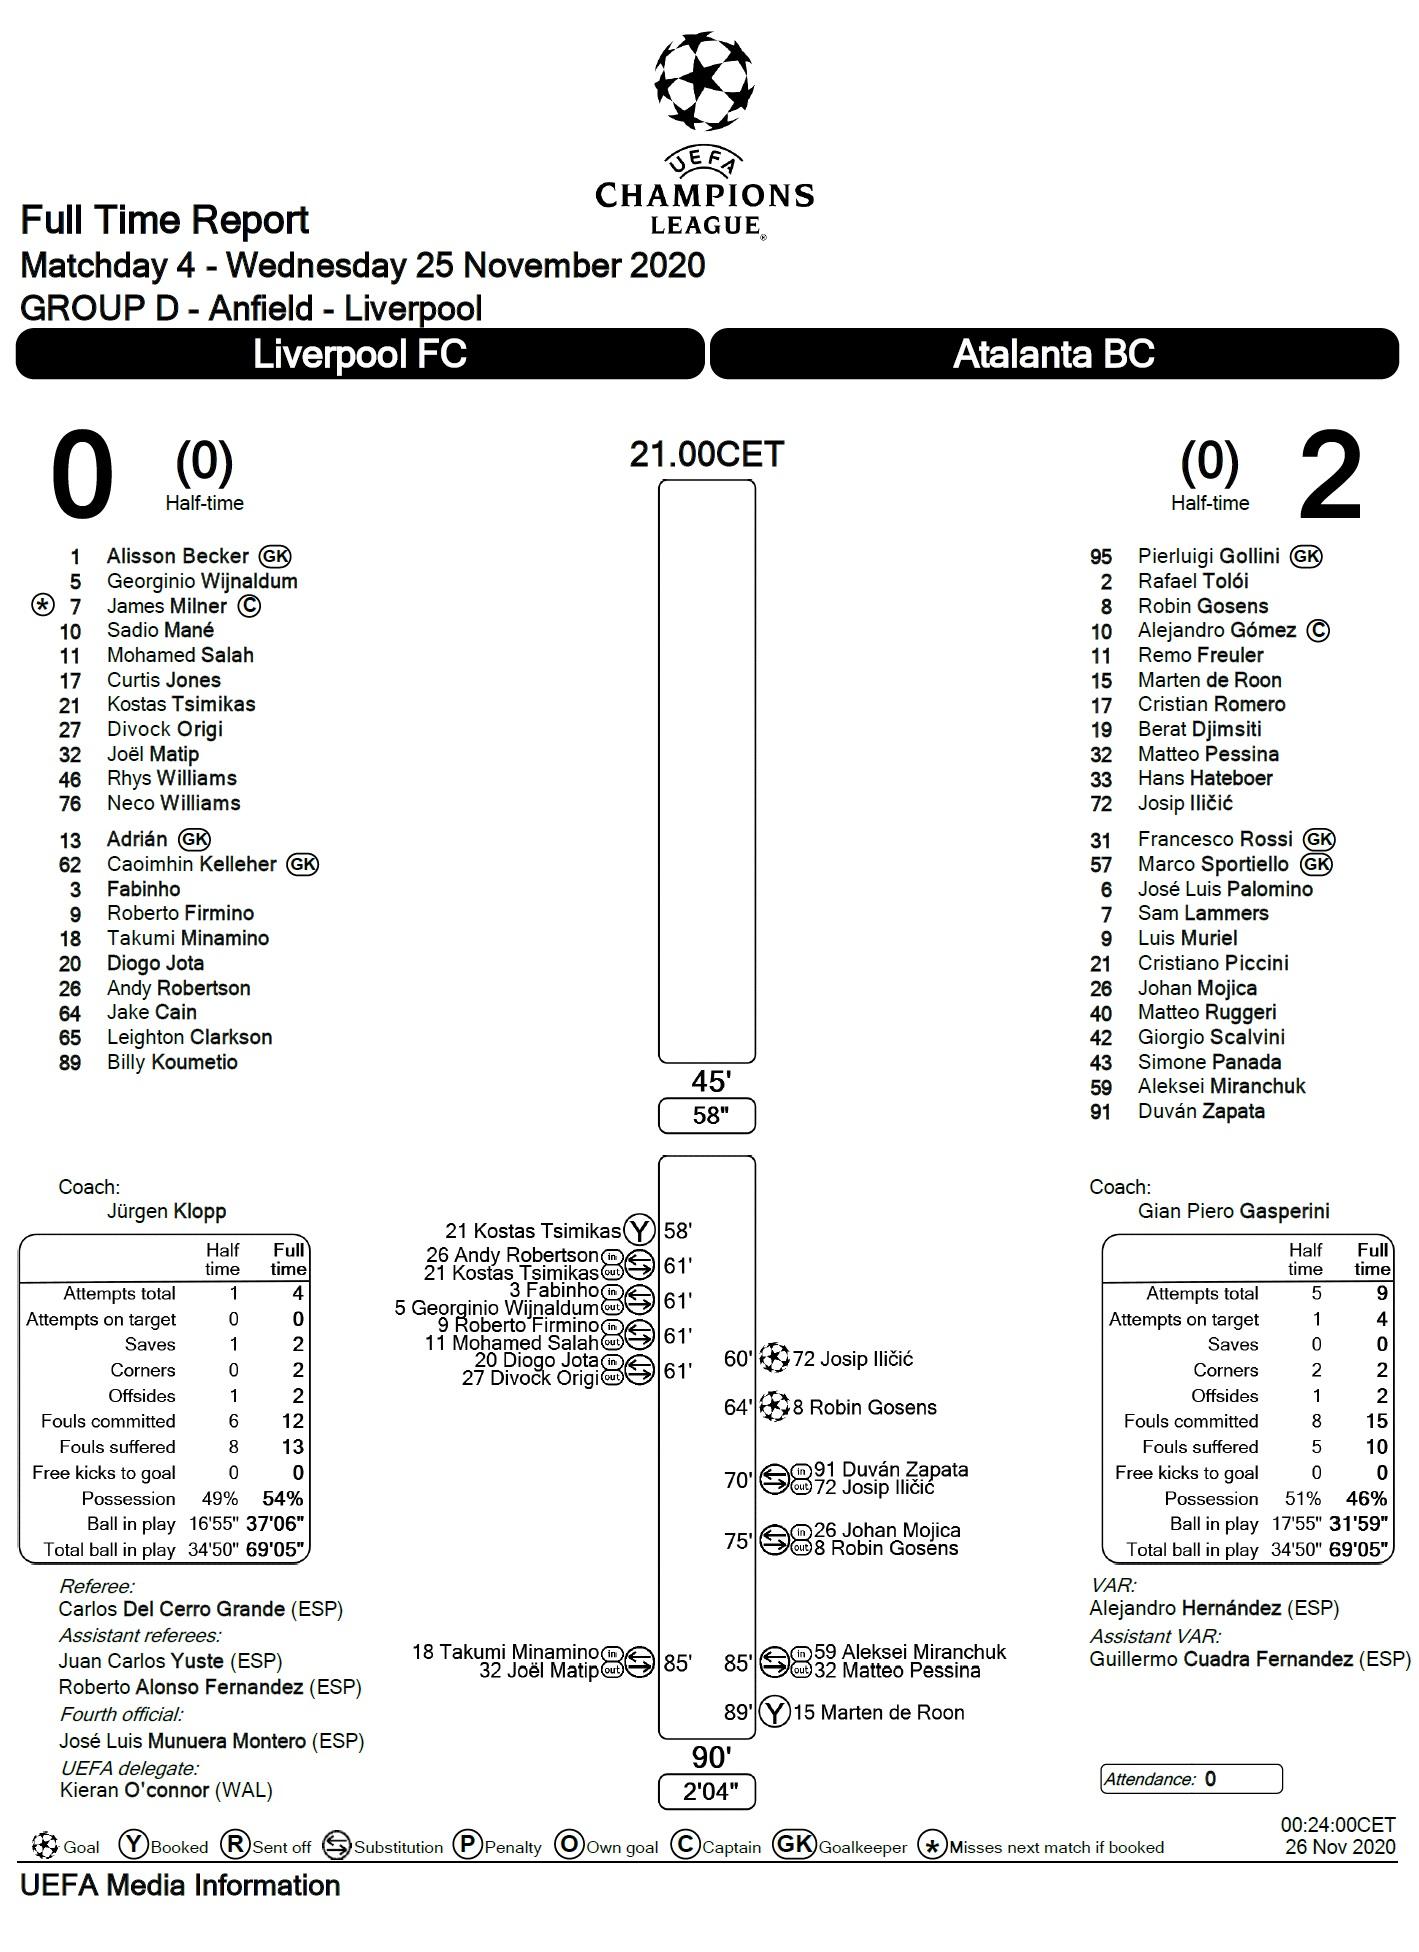 Ливерпуль (Англия) - Аталанта (Италия) 0:2